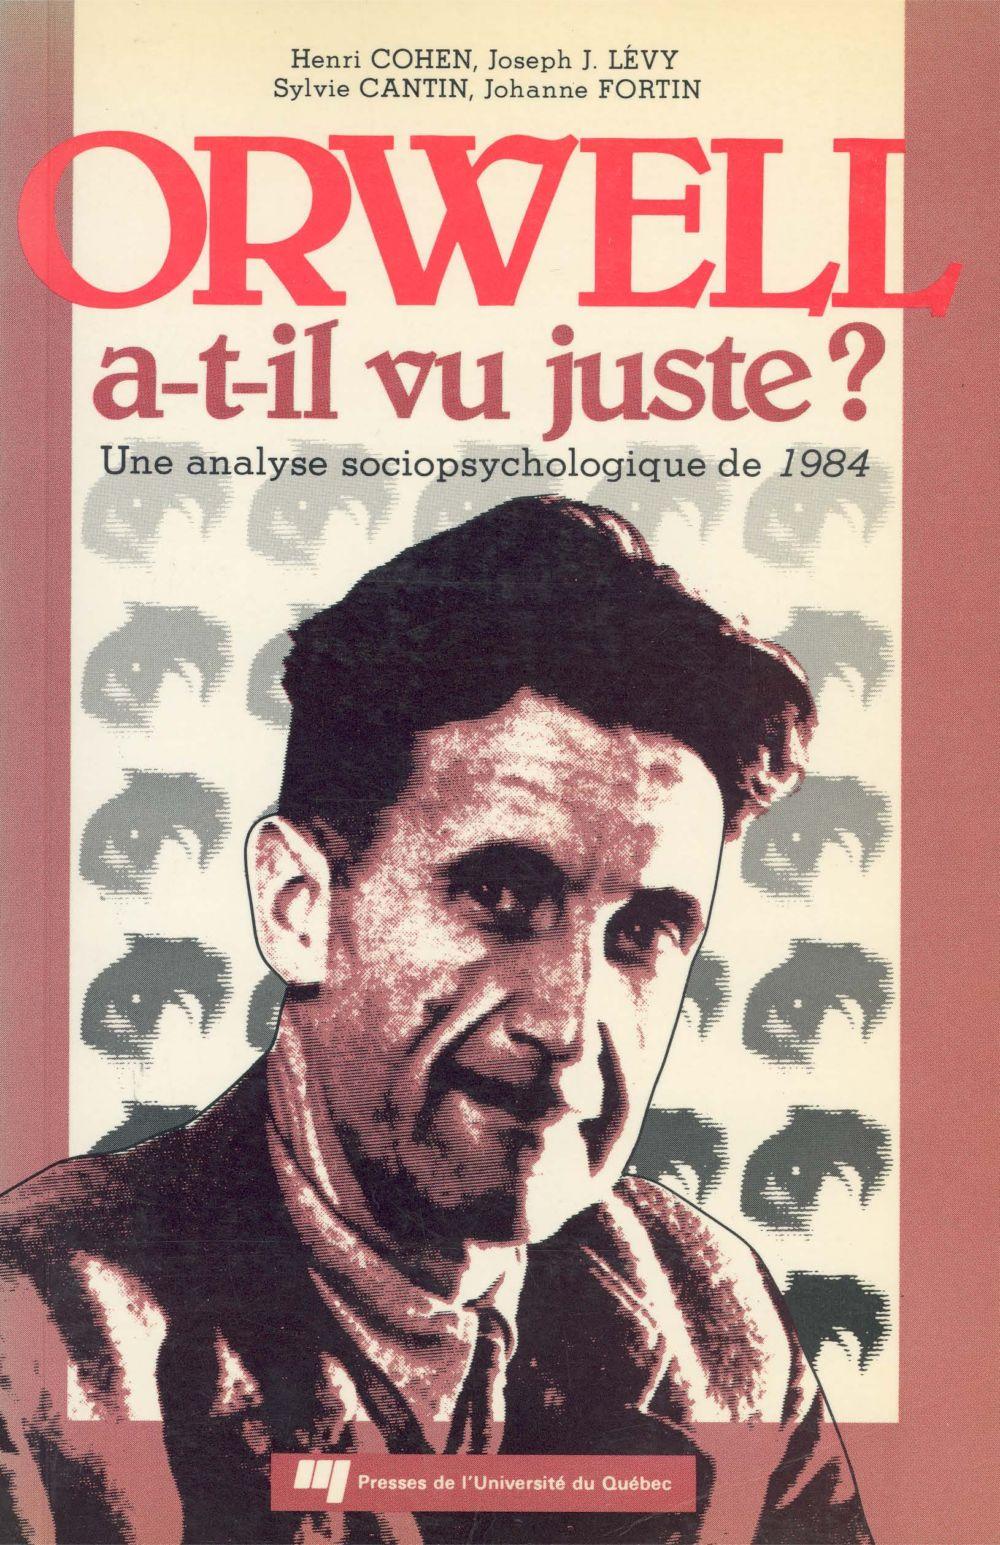 Orwell a-t-il vu juste ?